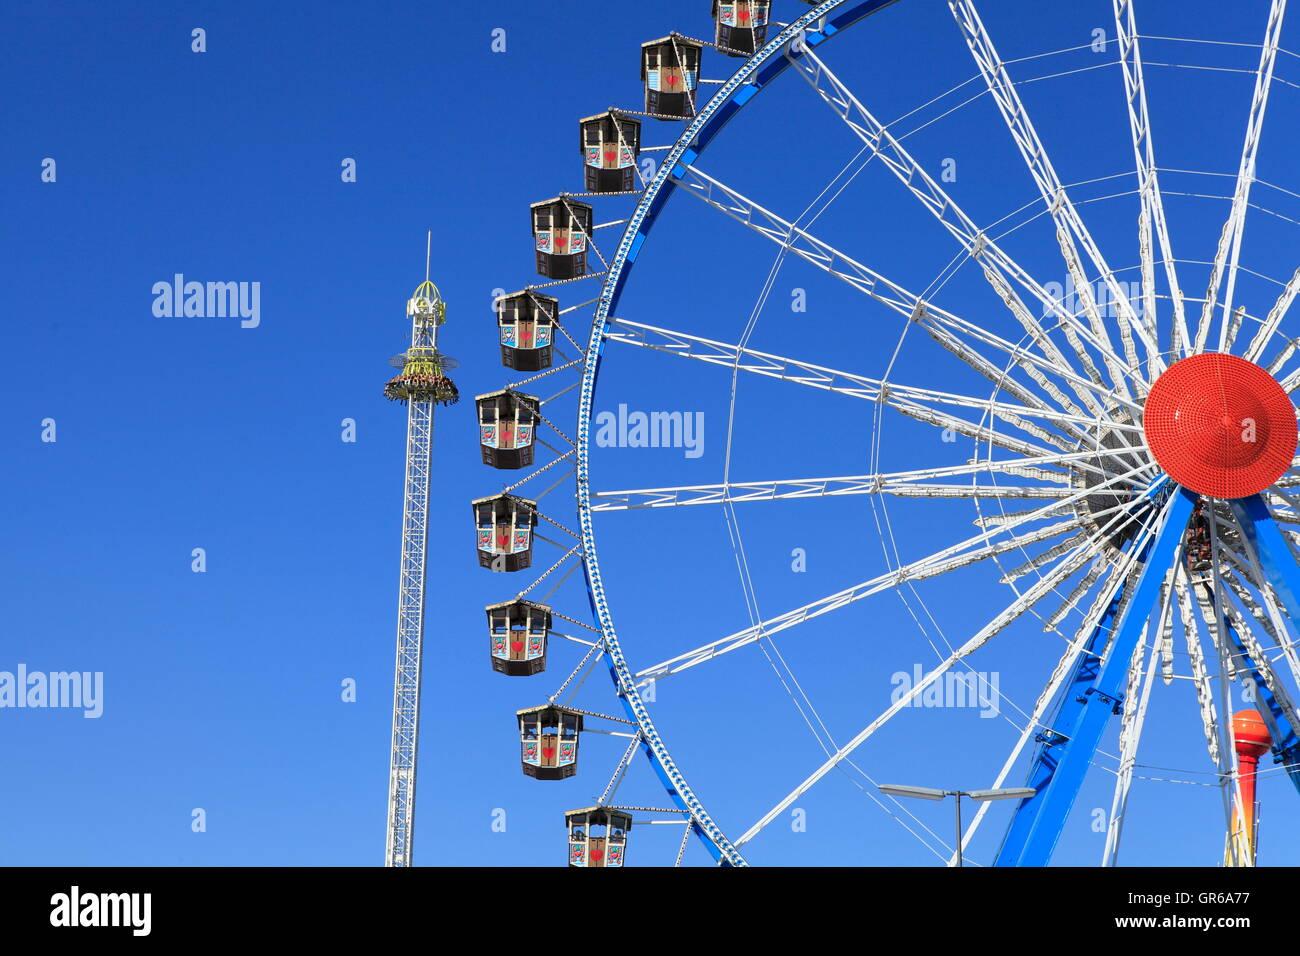 Willenborg Riesenrad, Oktoberfest, Munich, Bavaria, Germany, Europe - Stock Image